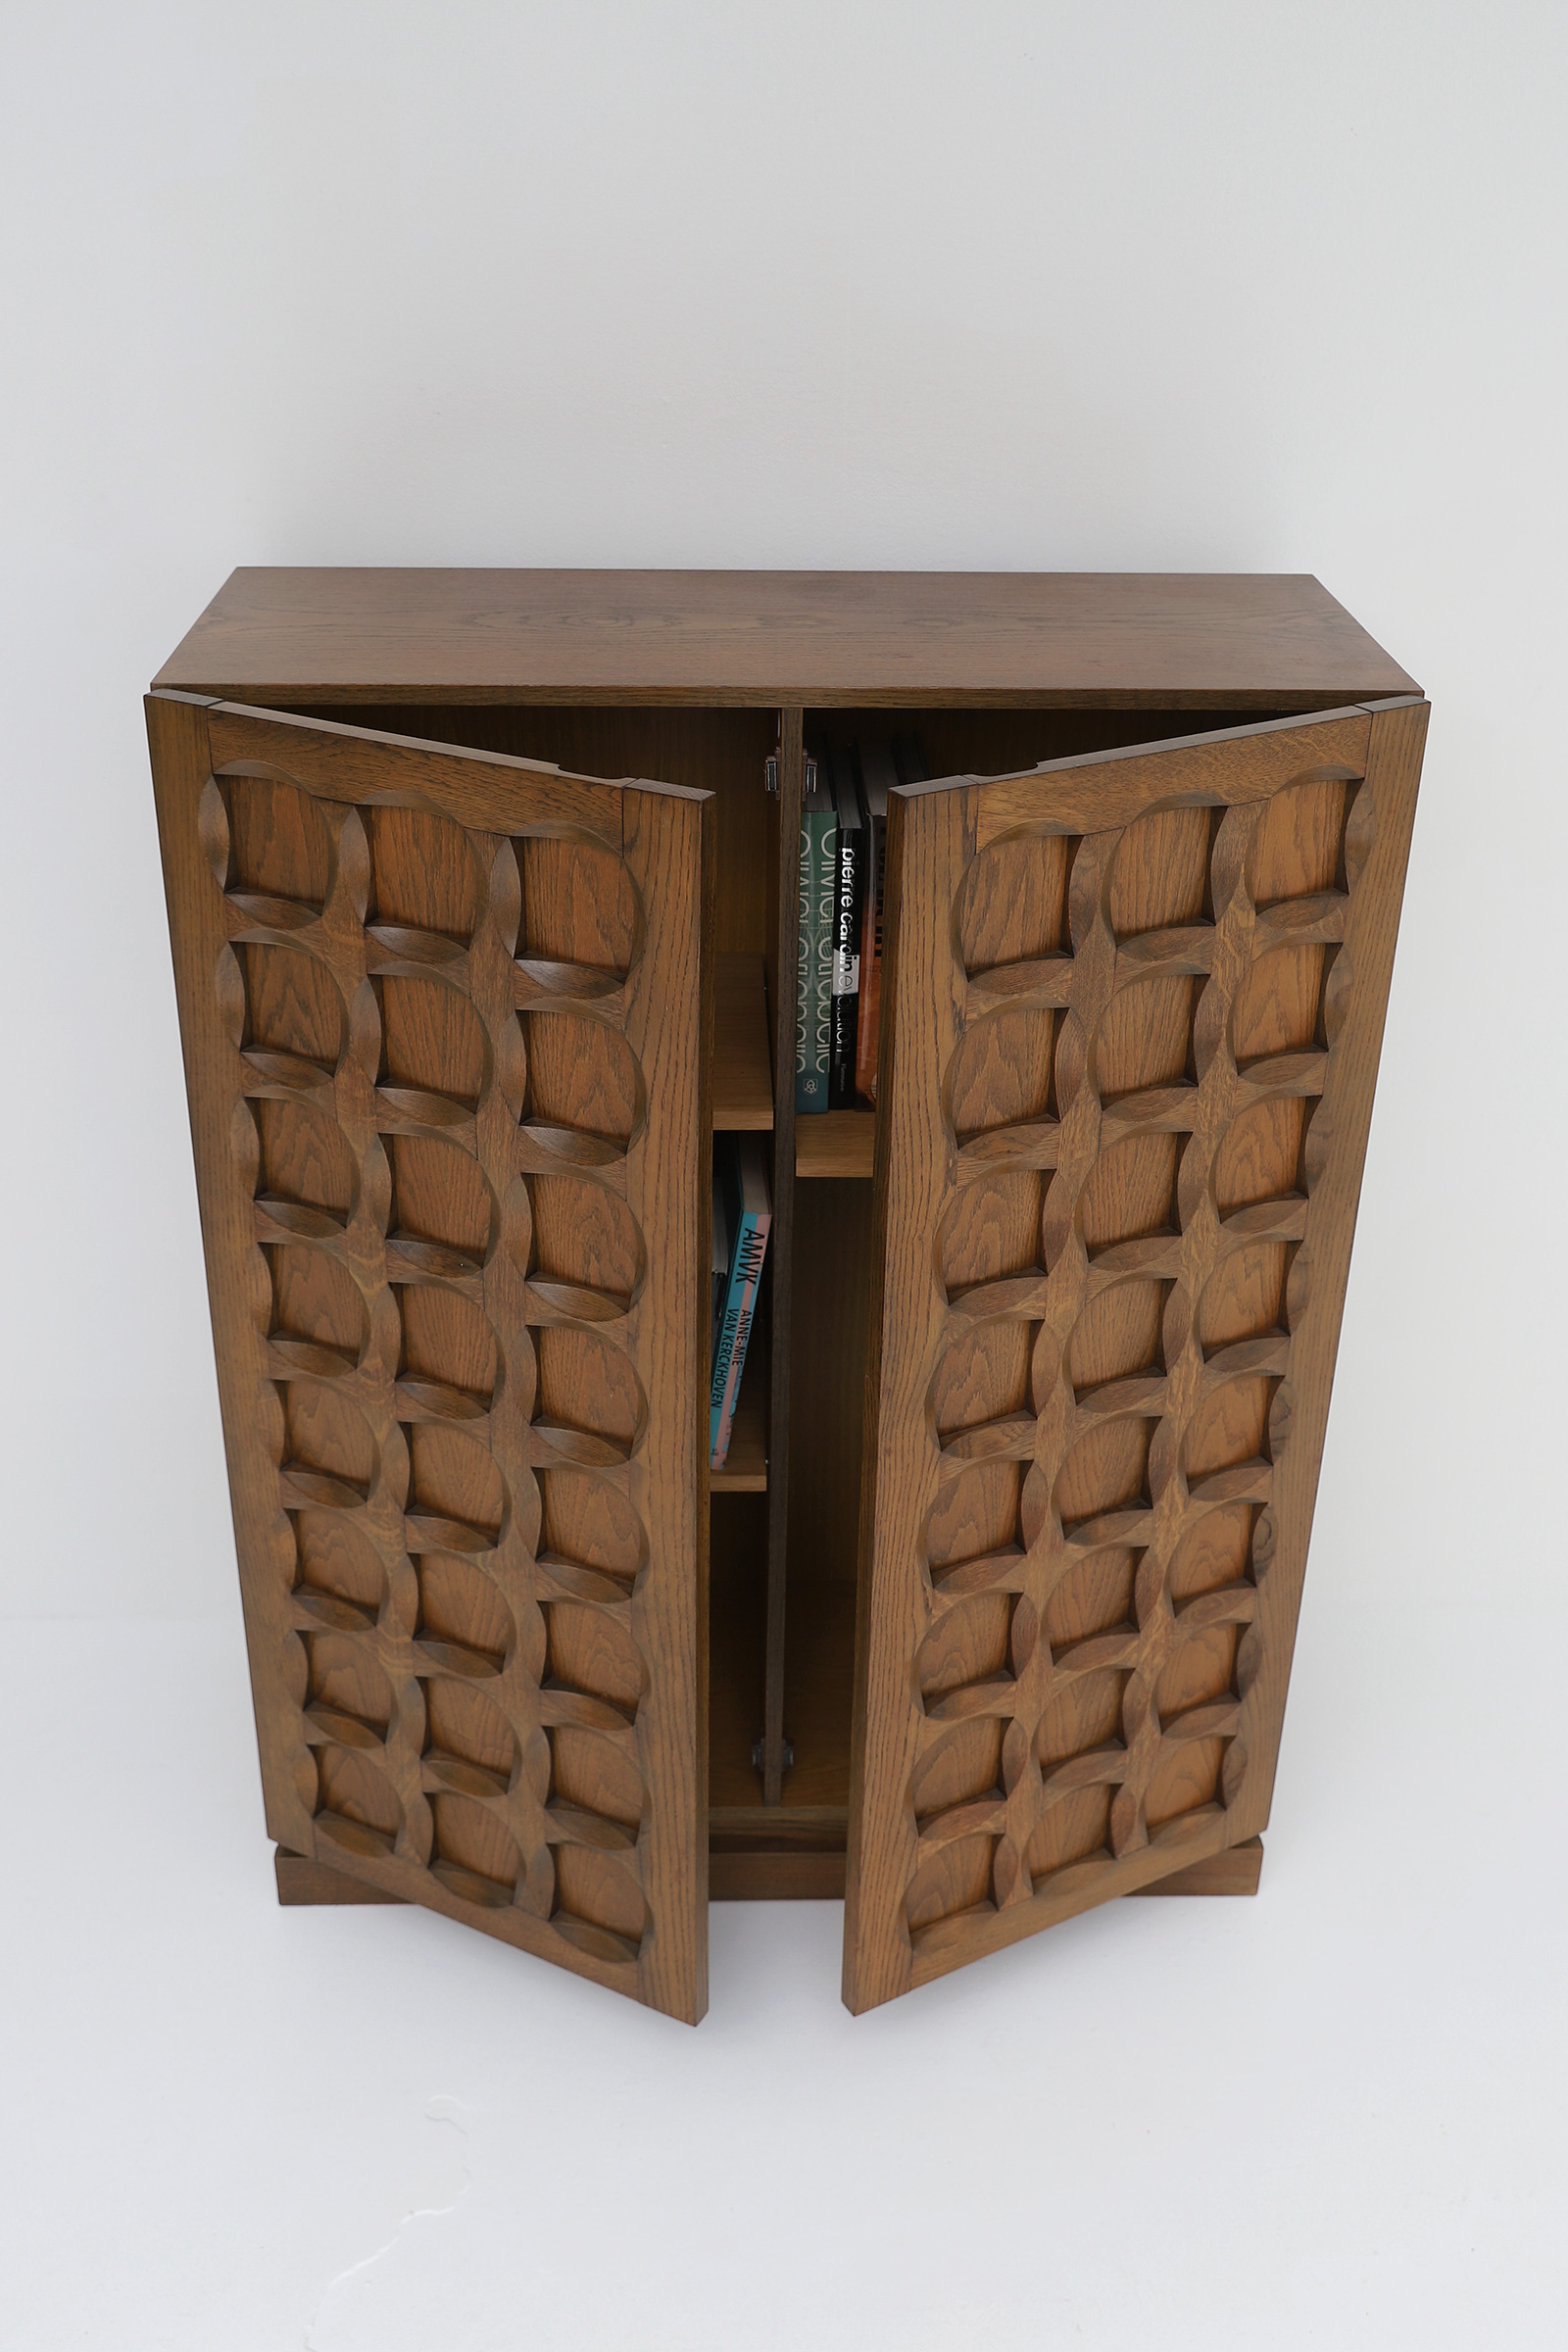 1970s Defour Cabinet Graphical Door Panels image 11